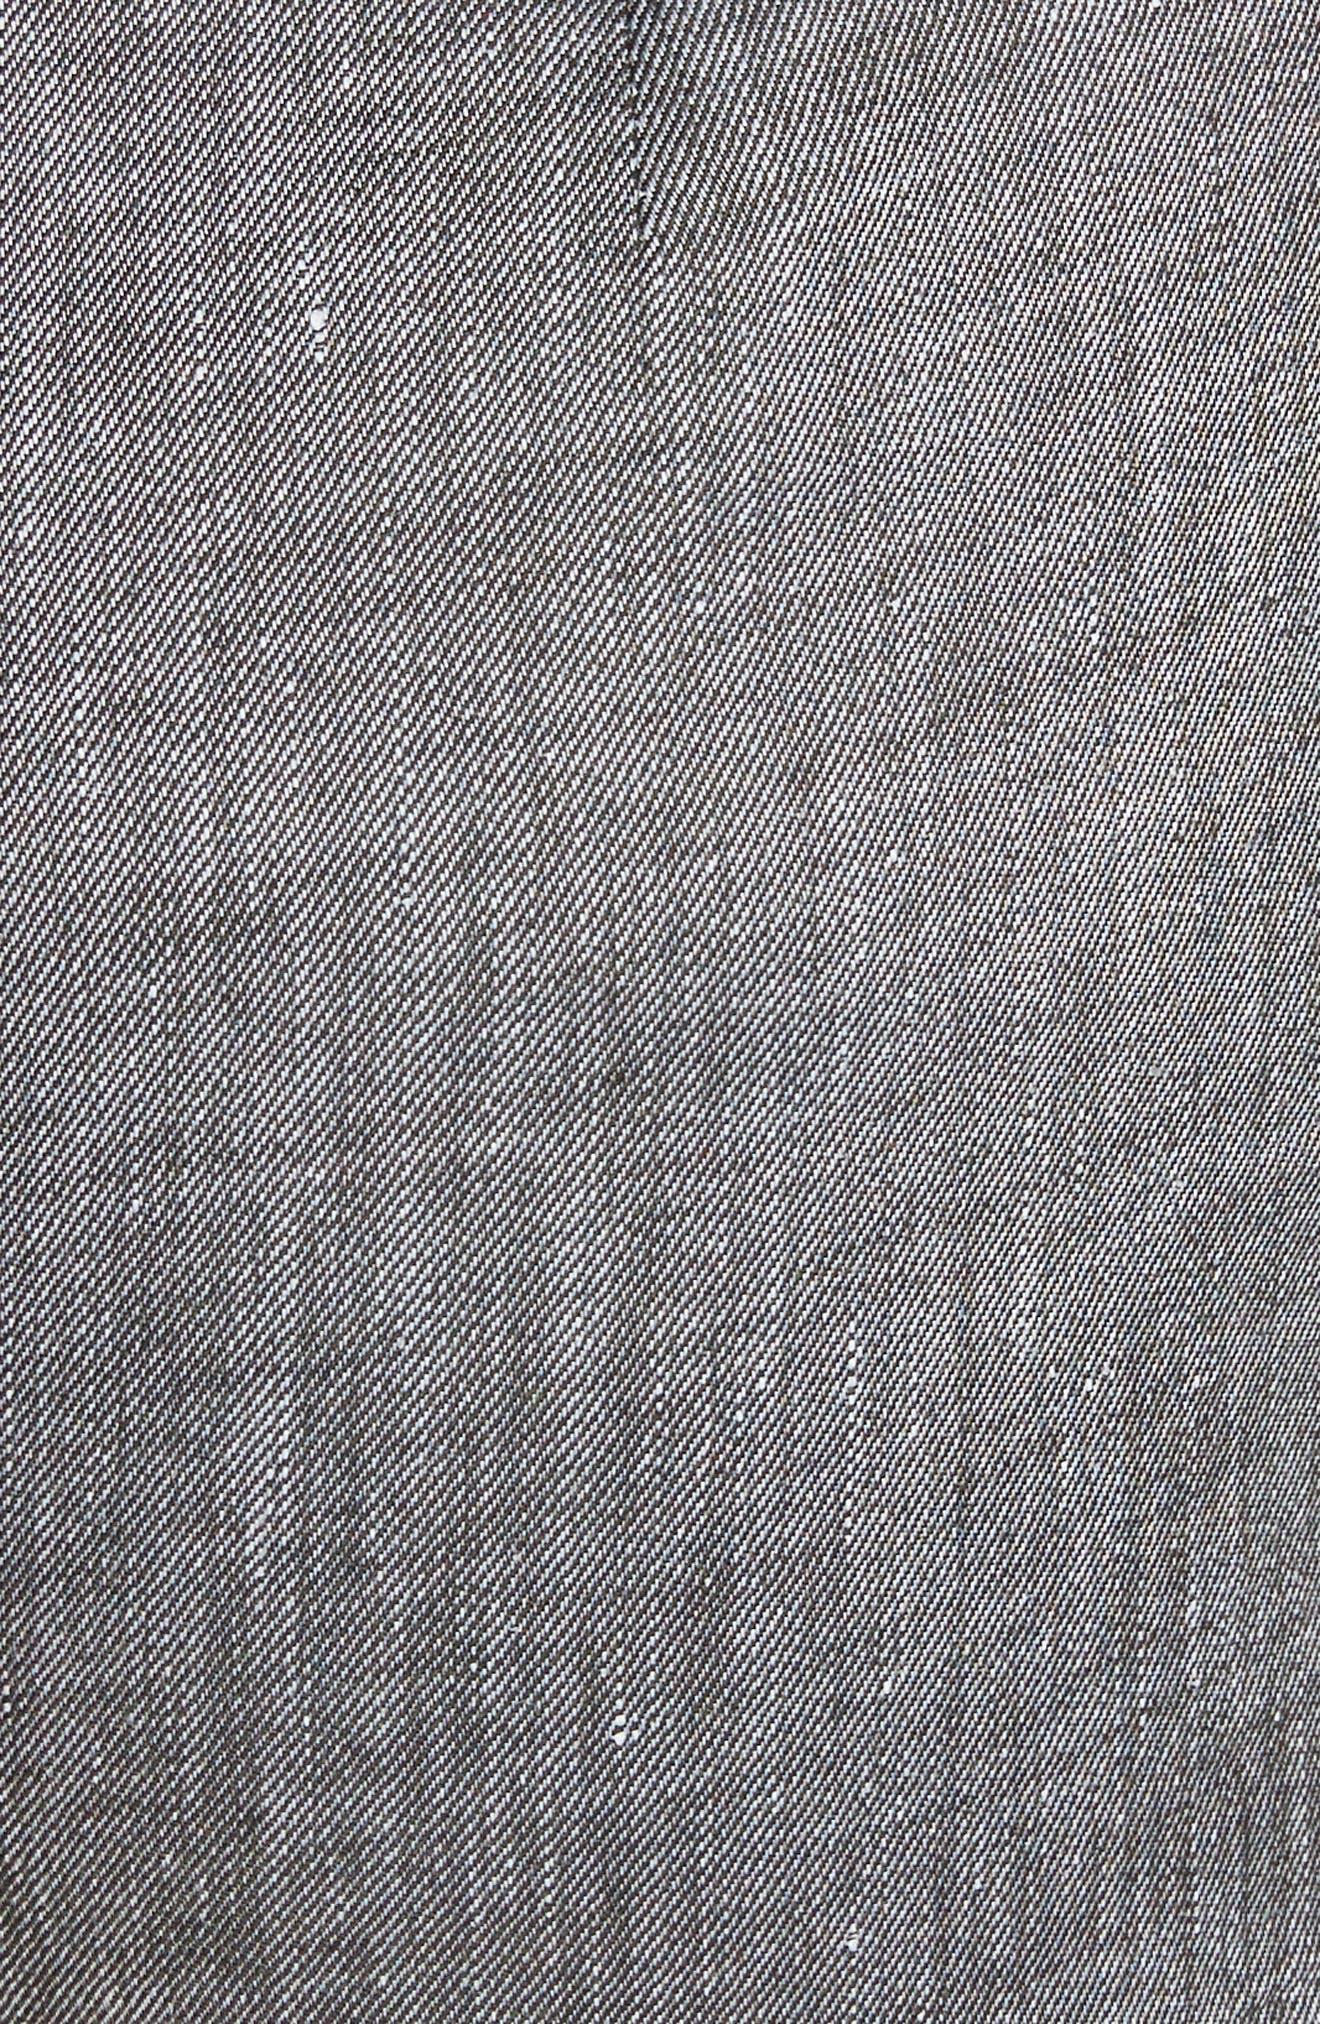 Trudee High Waist Shorts,                             Alternate thumbnail 5, color,                             309